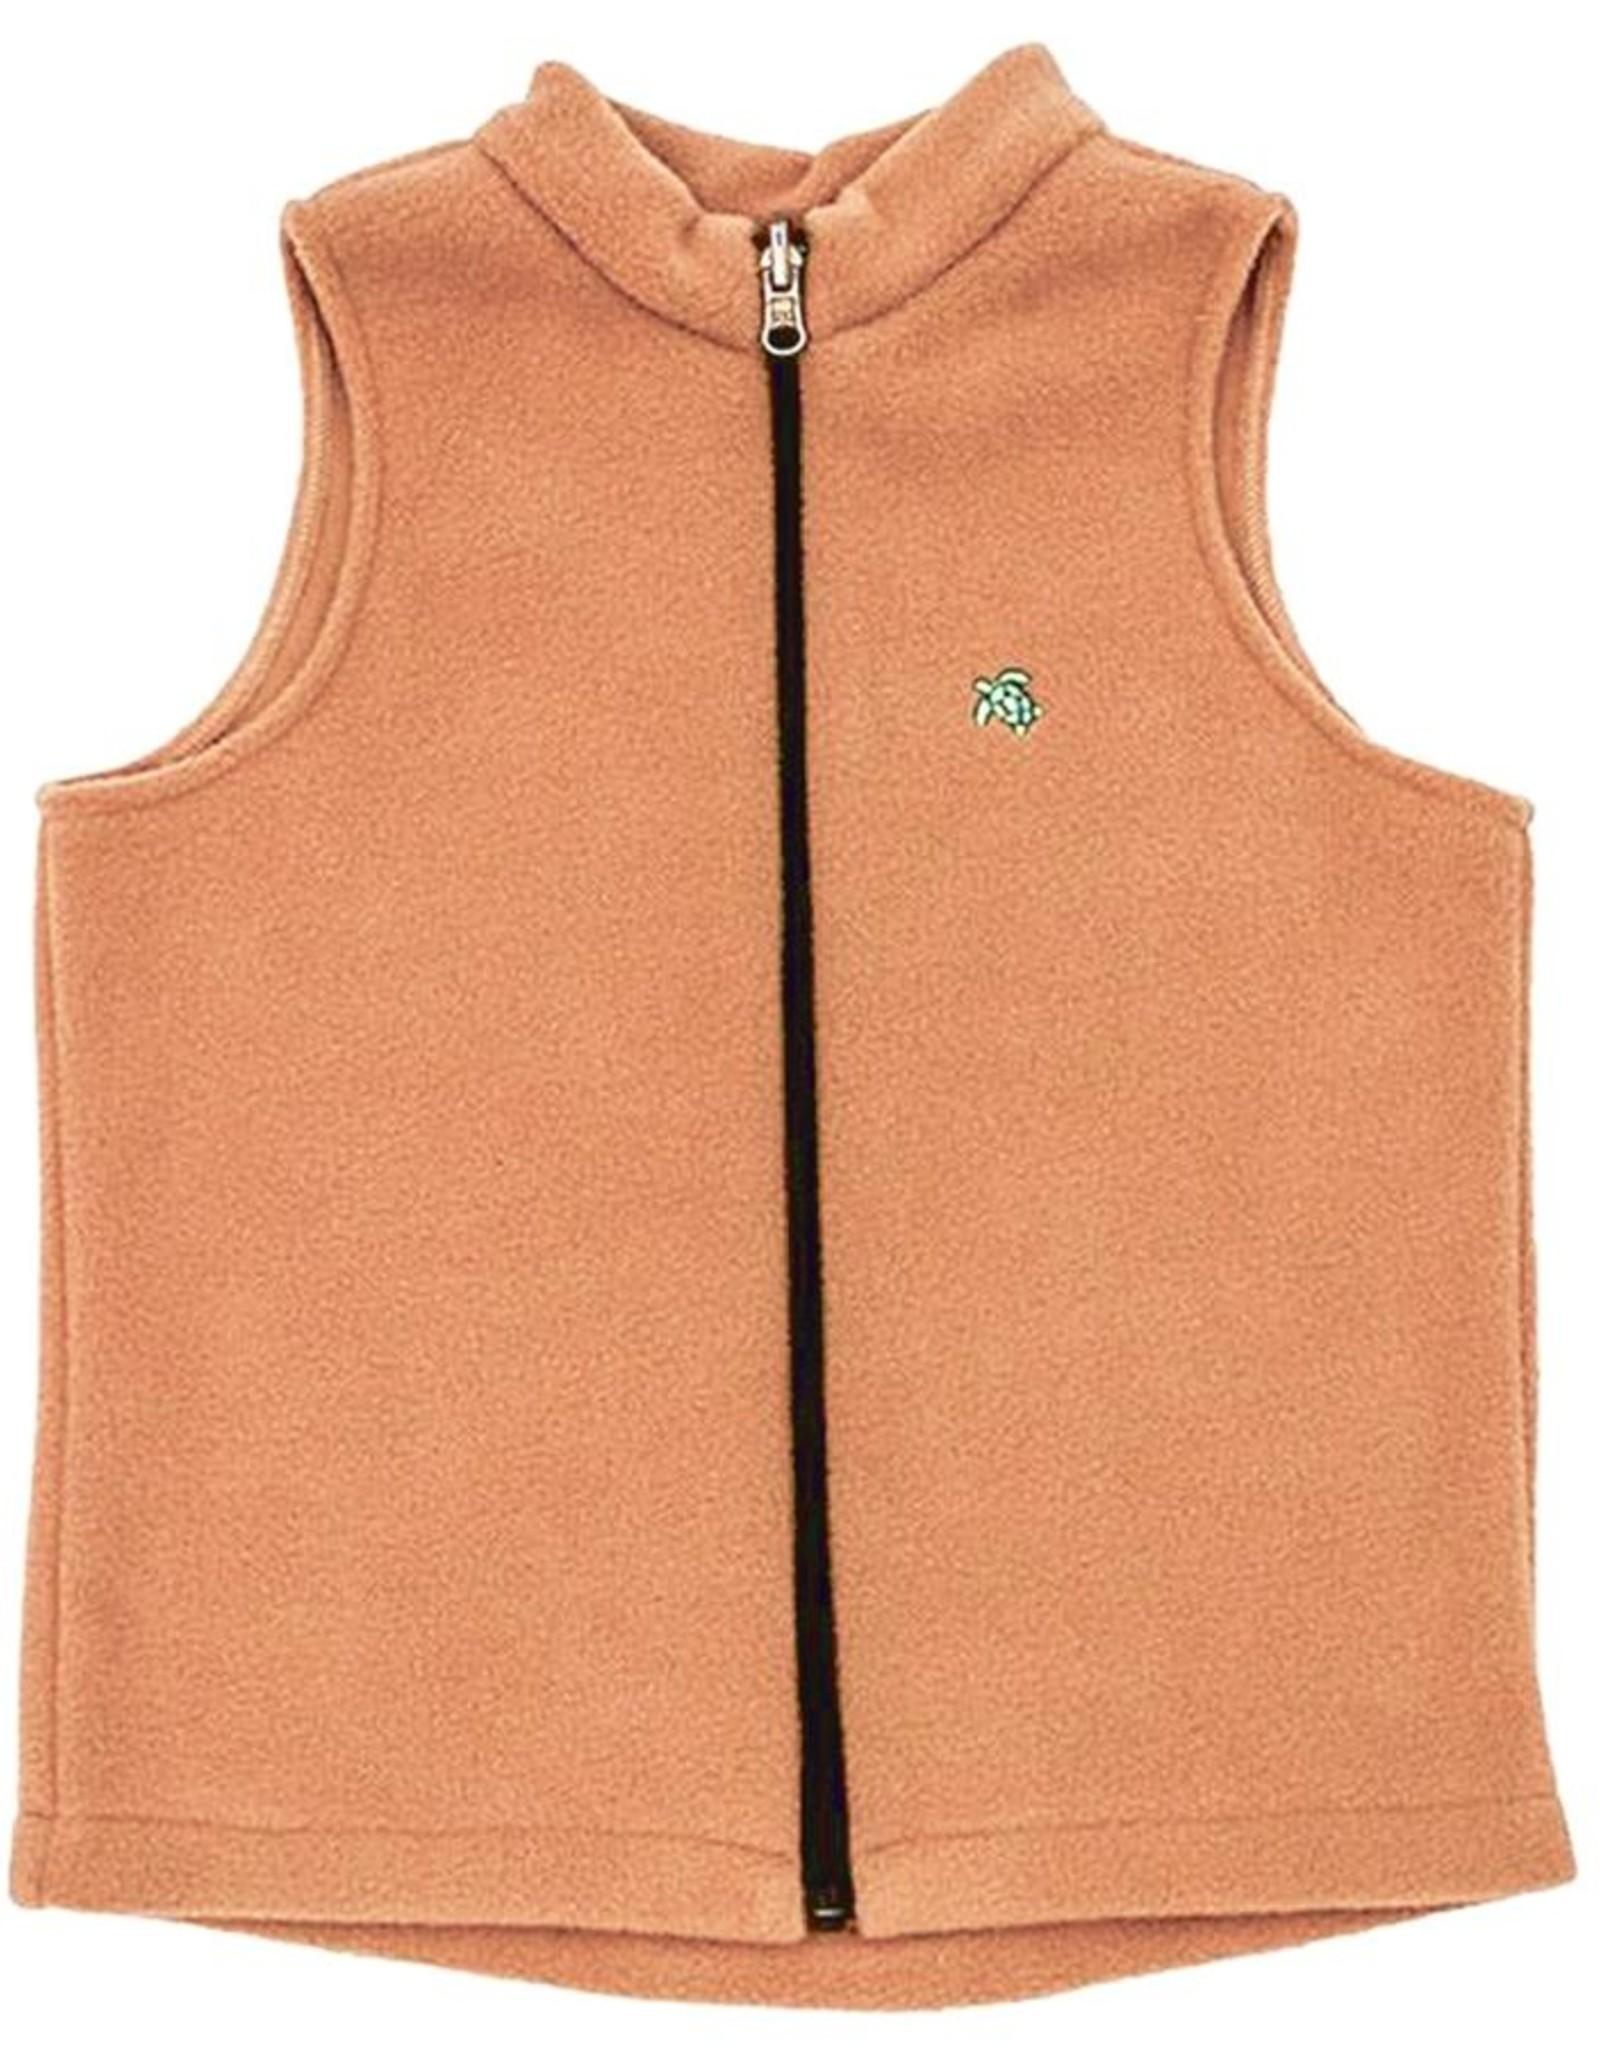 The Bailey Boys Mills Fleece Vest, Camel